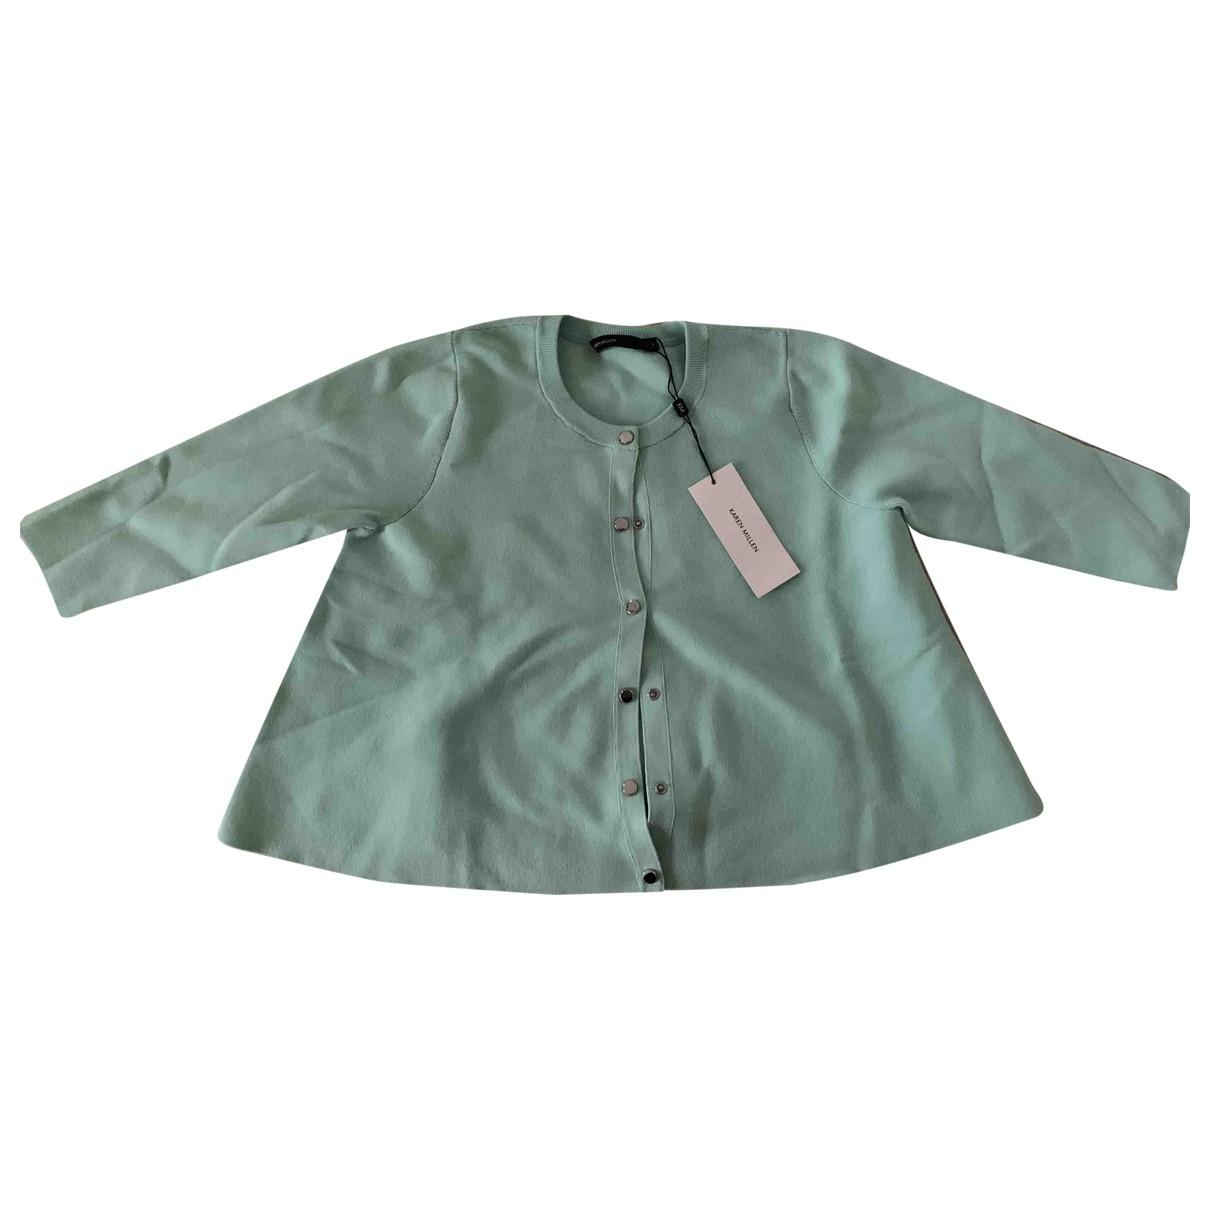 Karen Millen \N Green Knitwear for Women S International